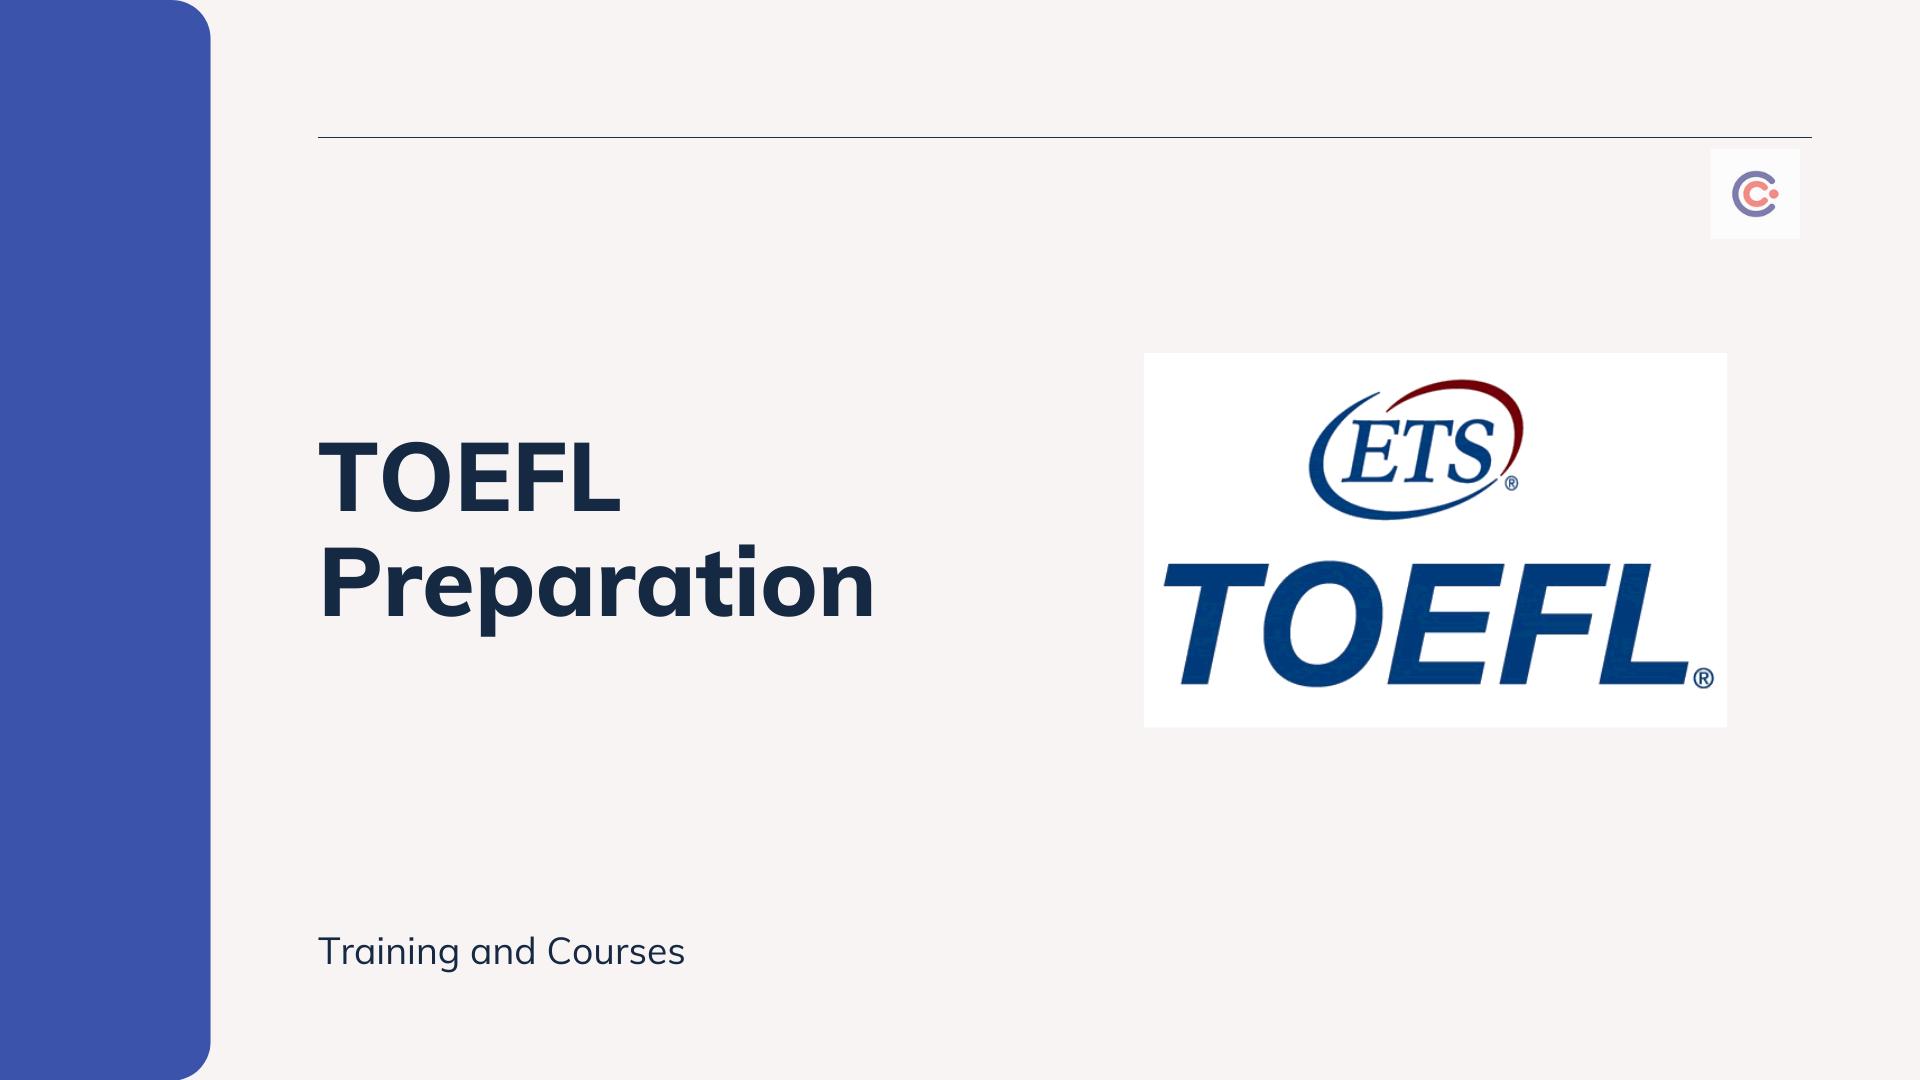 6 Best TOEFL Preparation Training and Courses - Prepare For TOEFL Exam Online